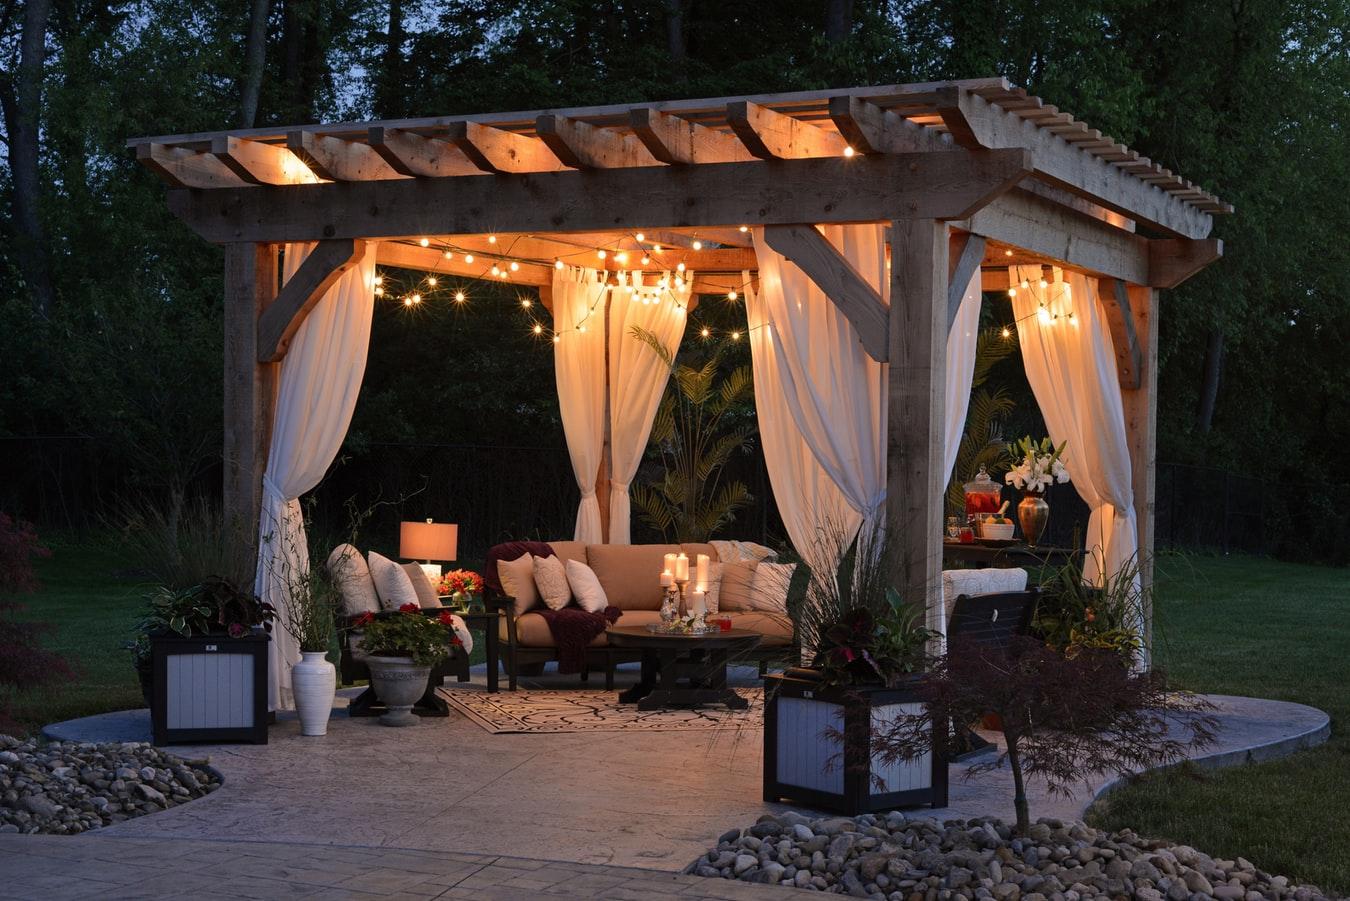 Why a Gazebo is a Great Backyard Design Upgrade